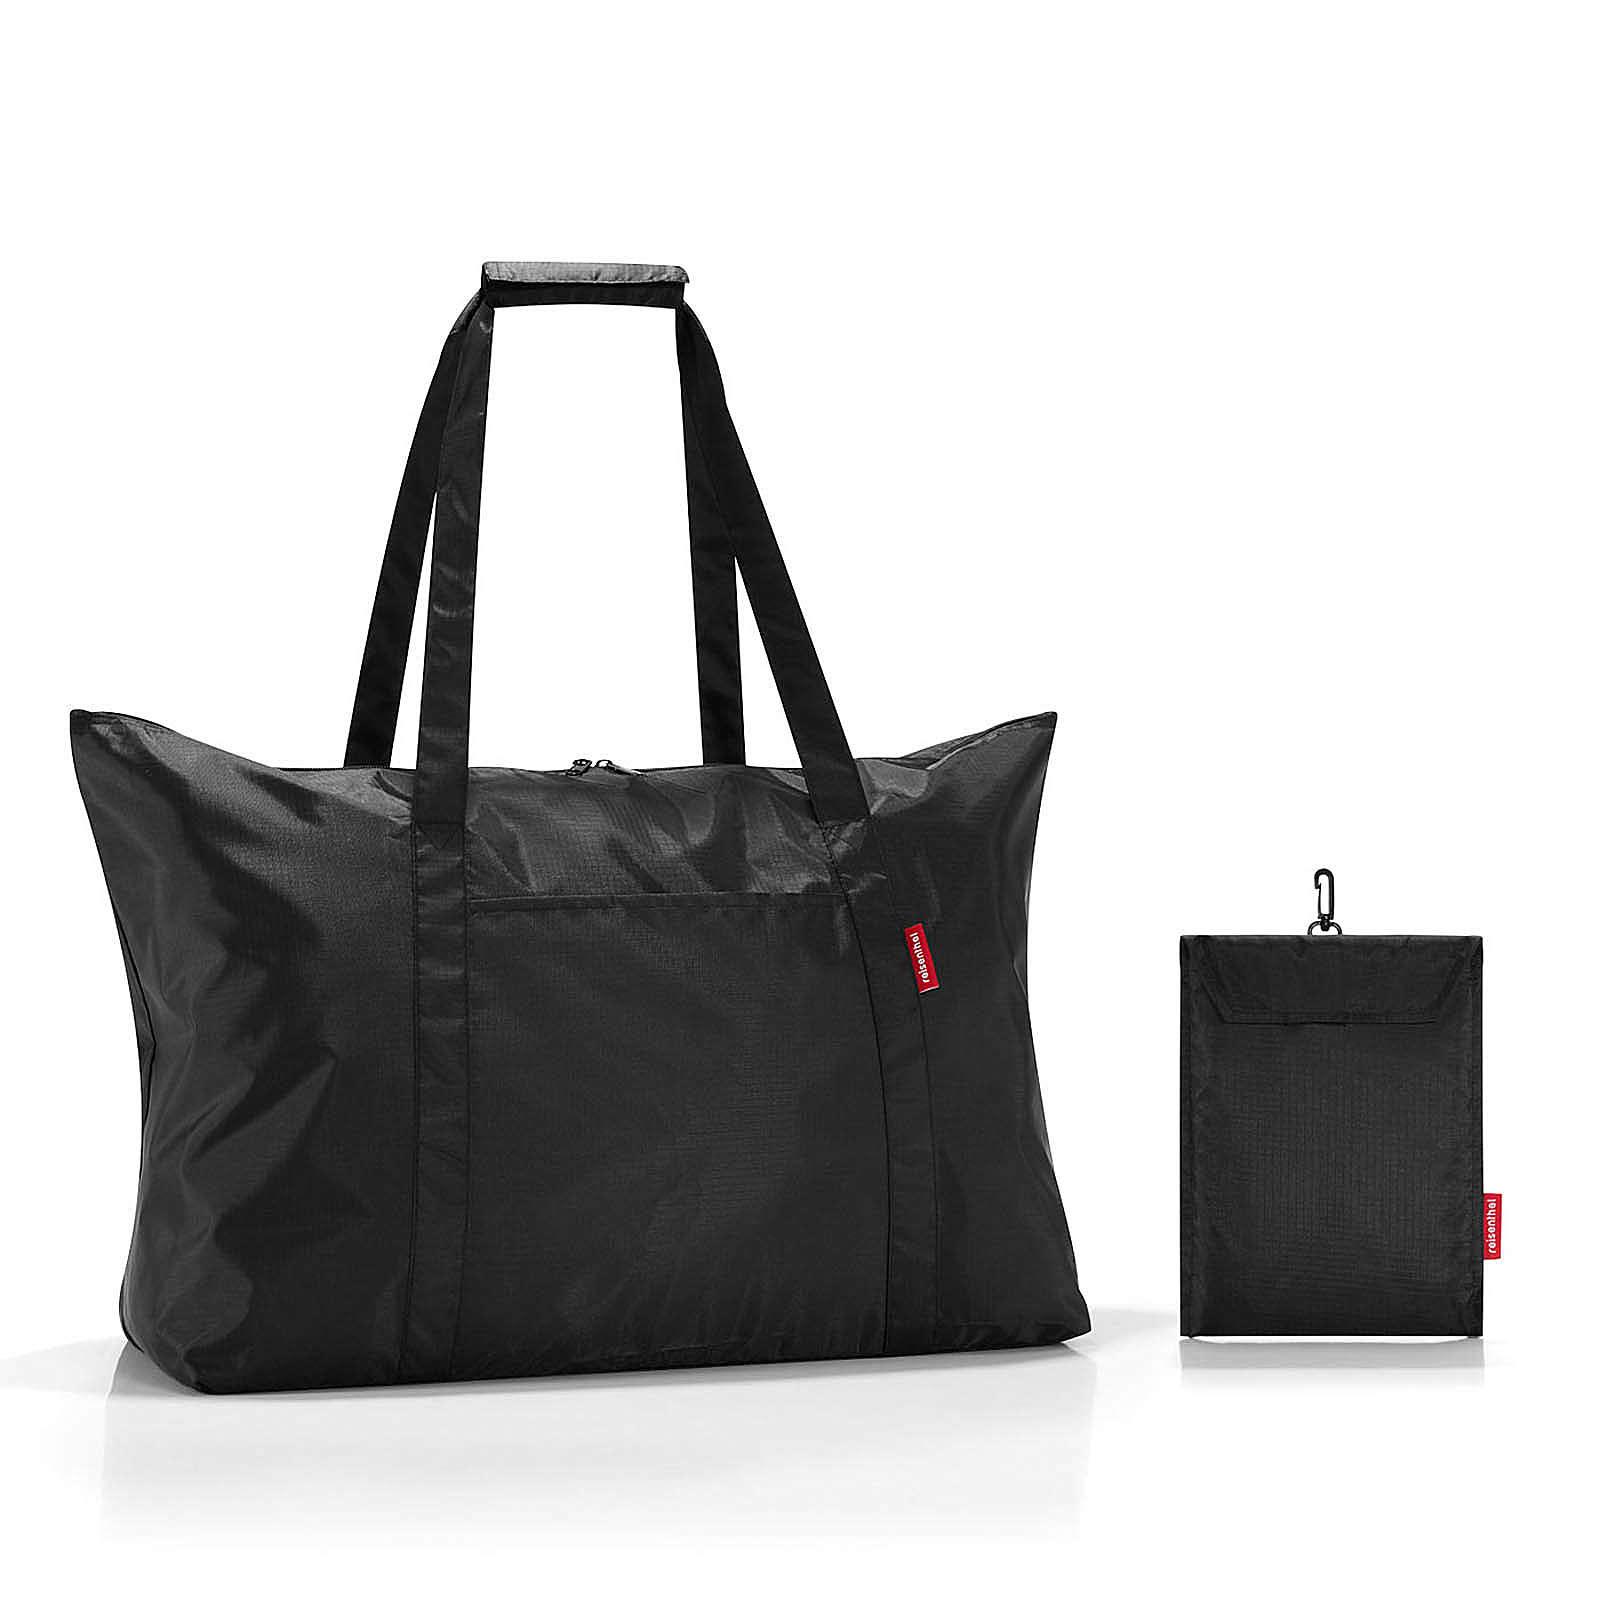 Reisenthel Badetasche mini maxi travelbag schwarz